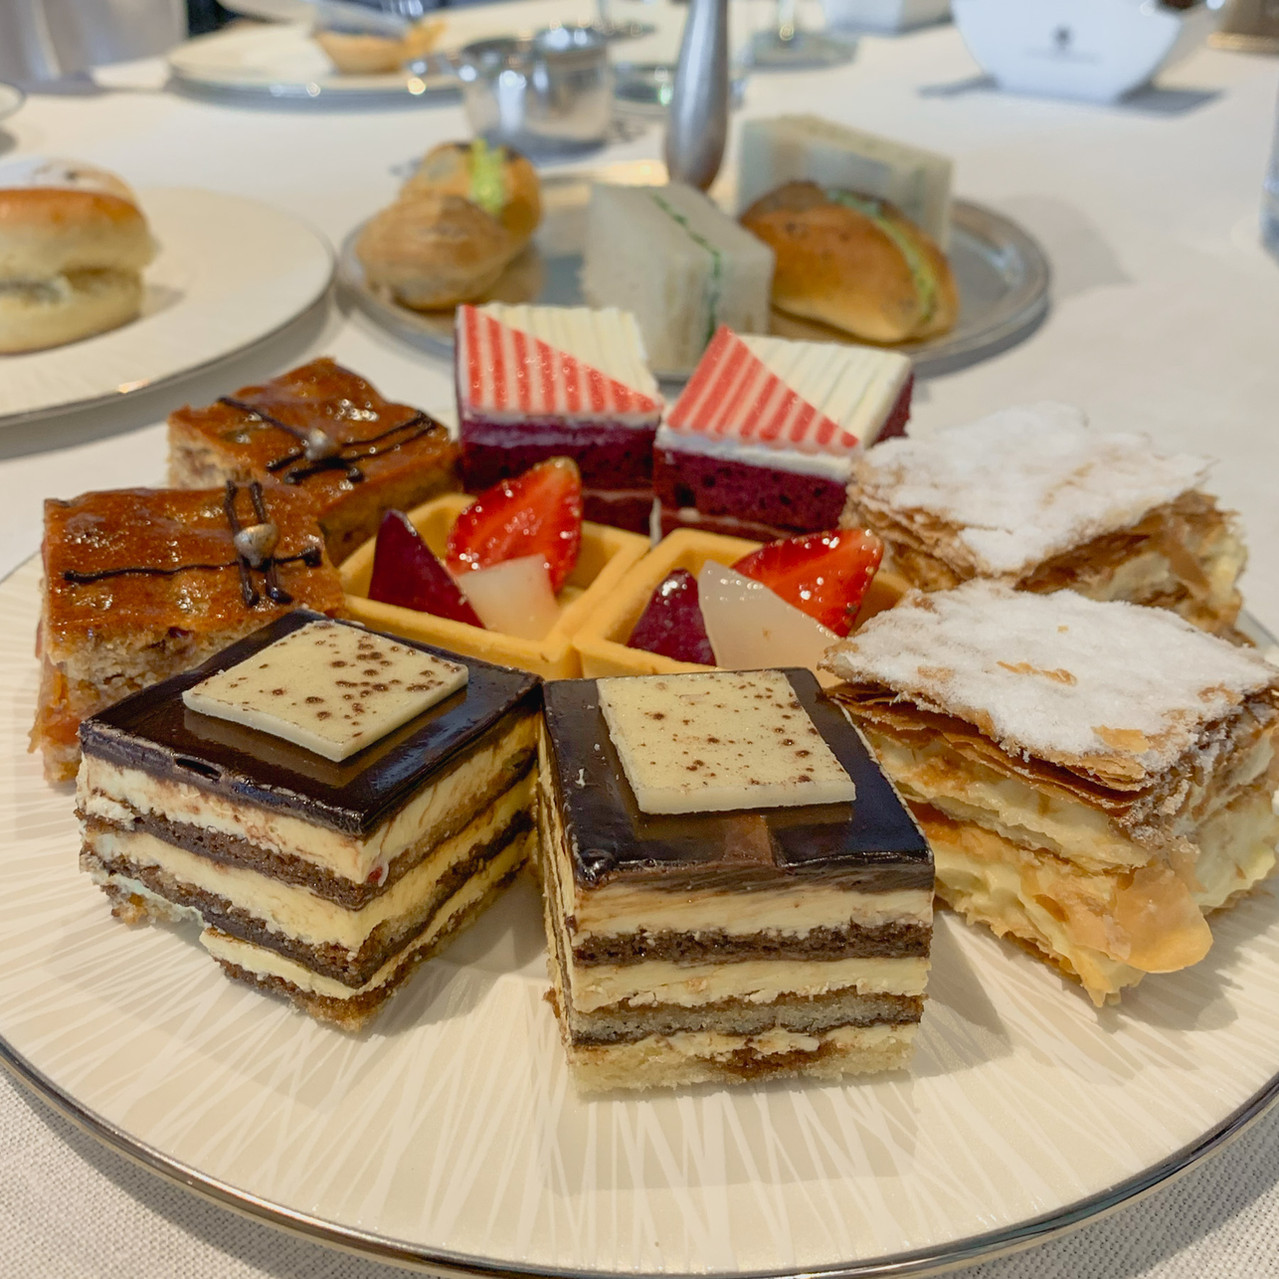 E&O Hotel afternoon tea: Mini cakes and fruit tarts on a white plate, RollingBear Travels blog.